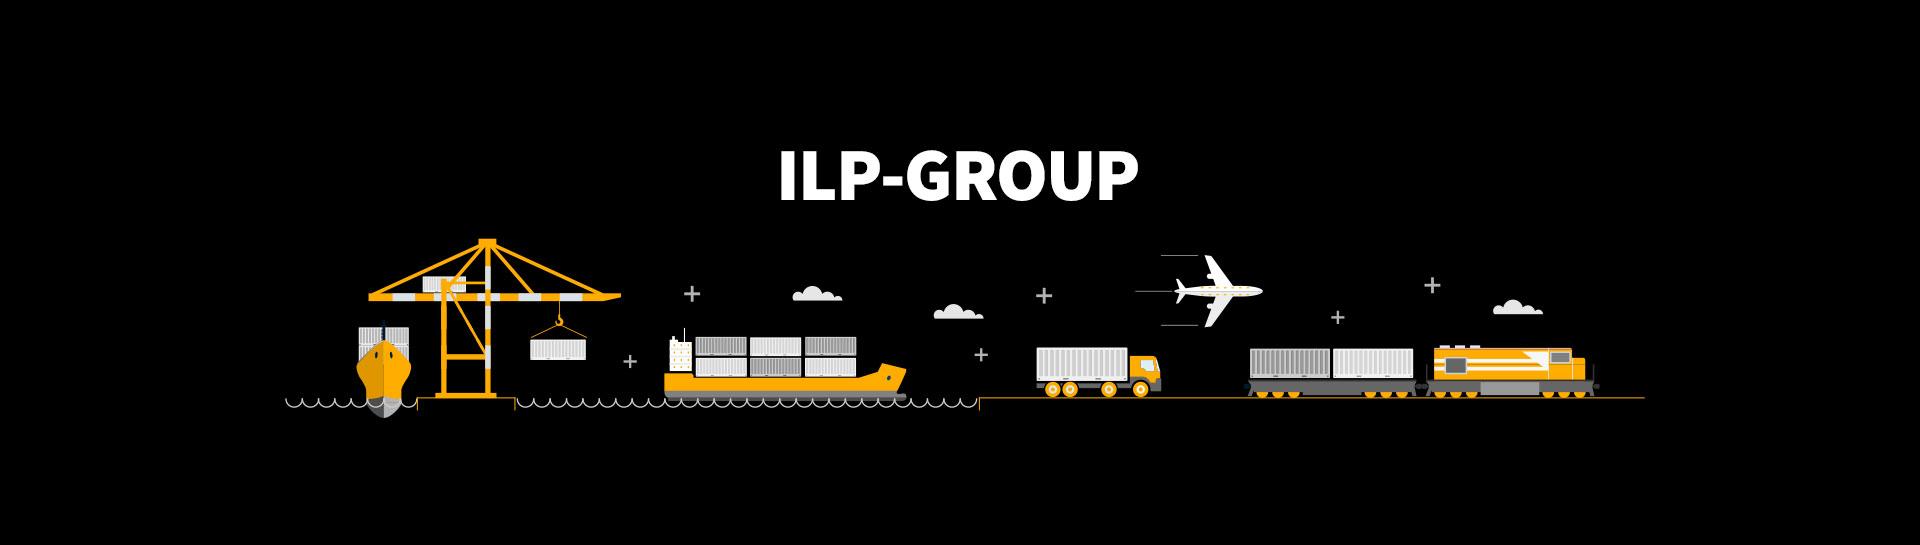 Ilp Group